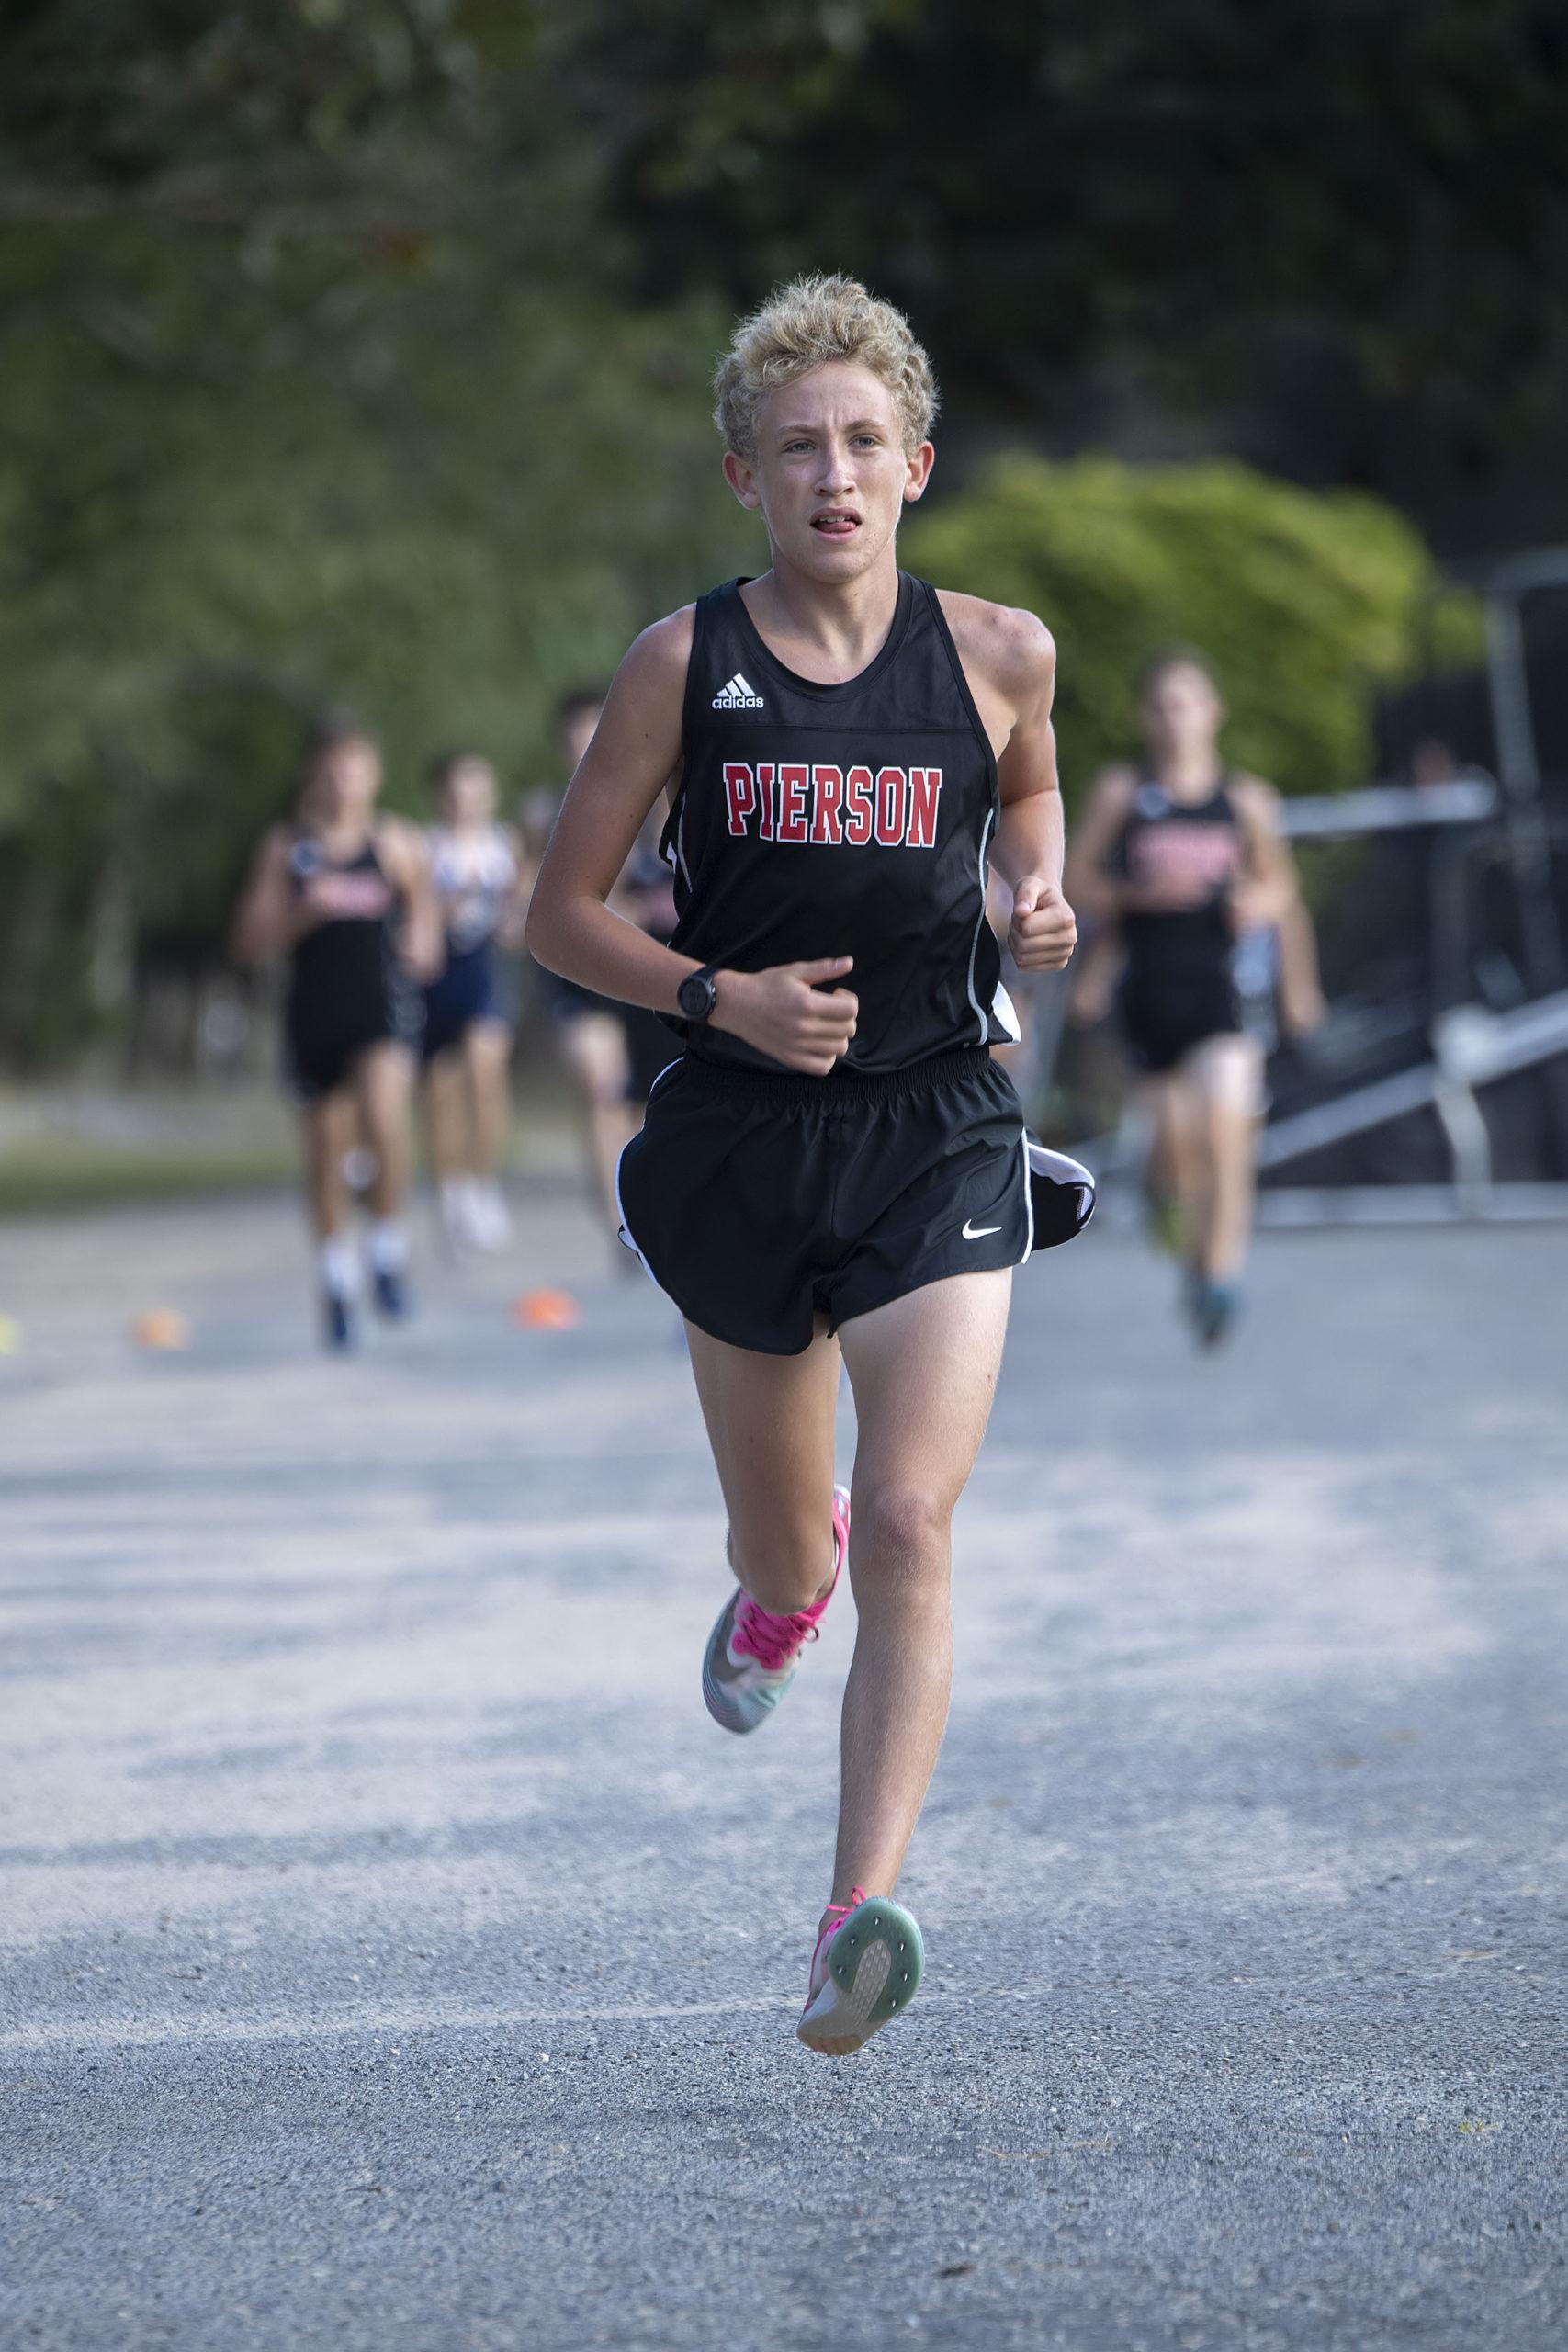 Pierson Cross Country Runner Ben McErlean competes against the Ross School last year   MICHAEL HELLER